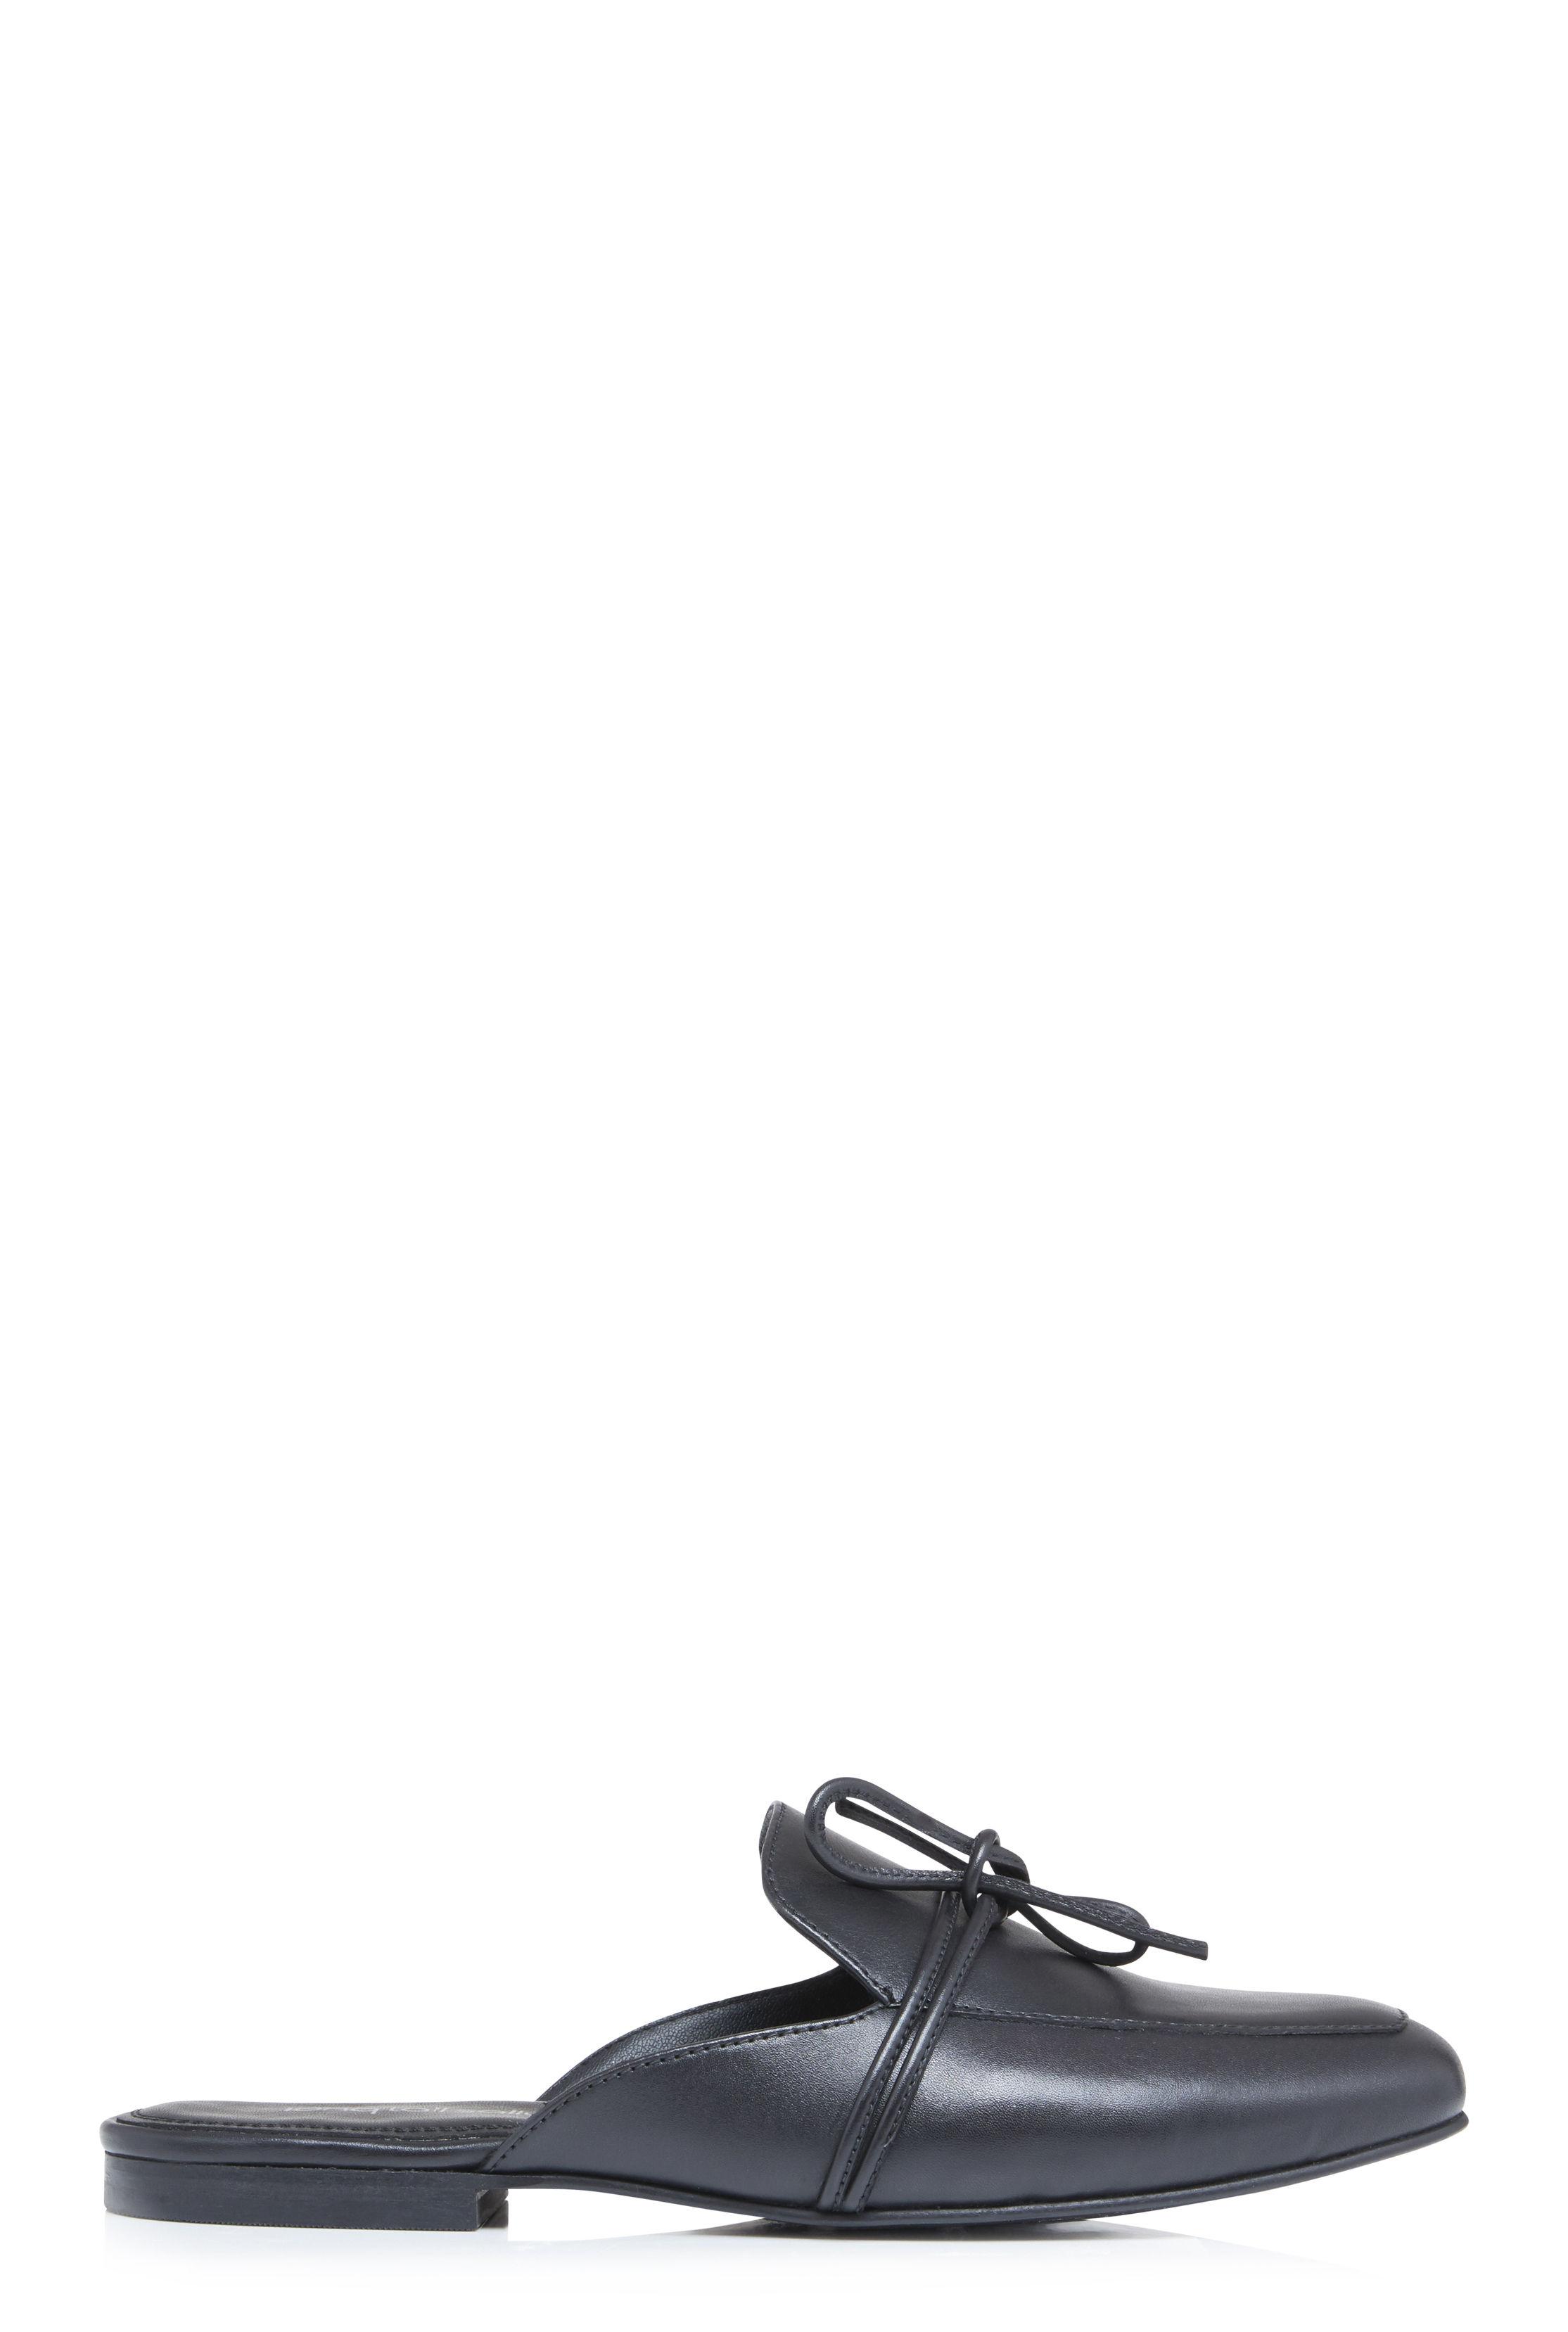 LTS Black Klara Leather Mule